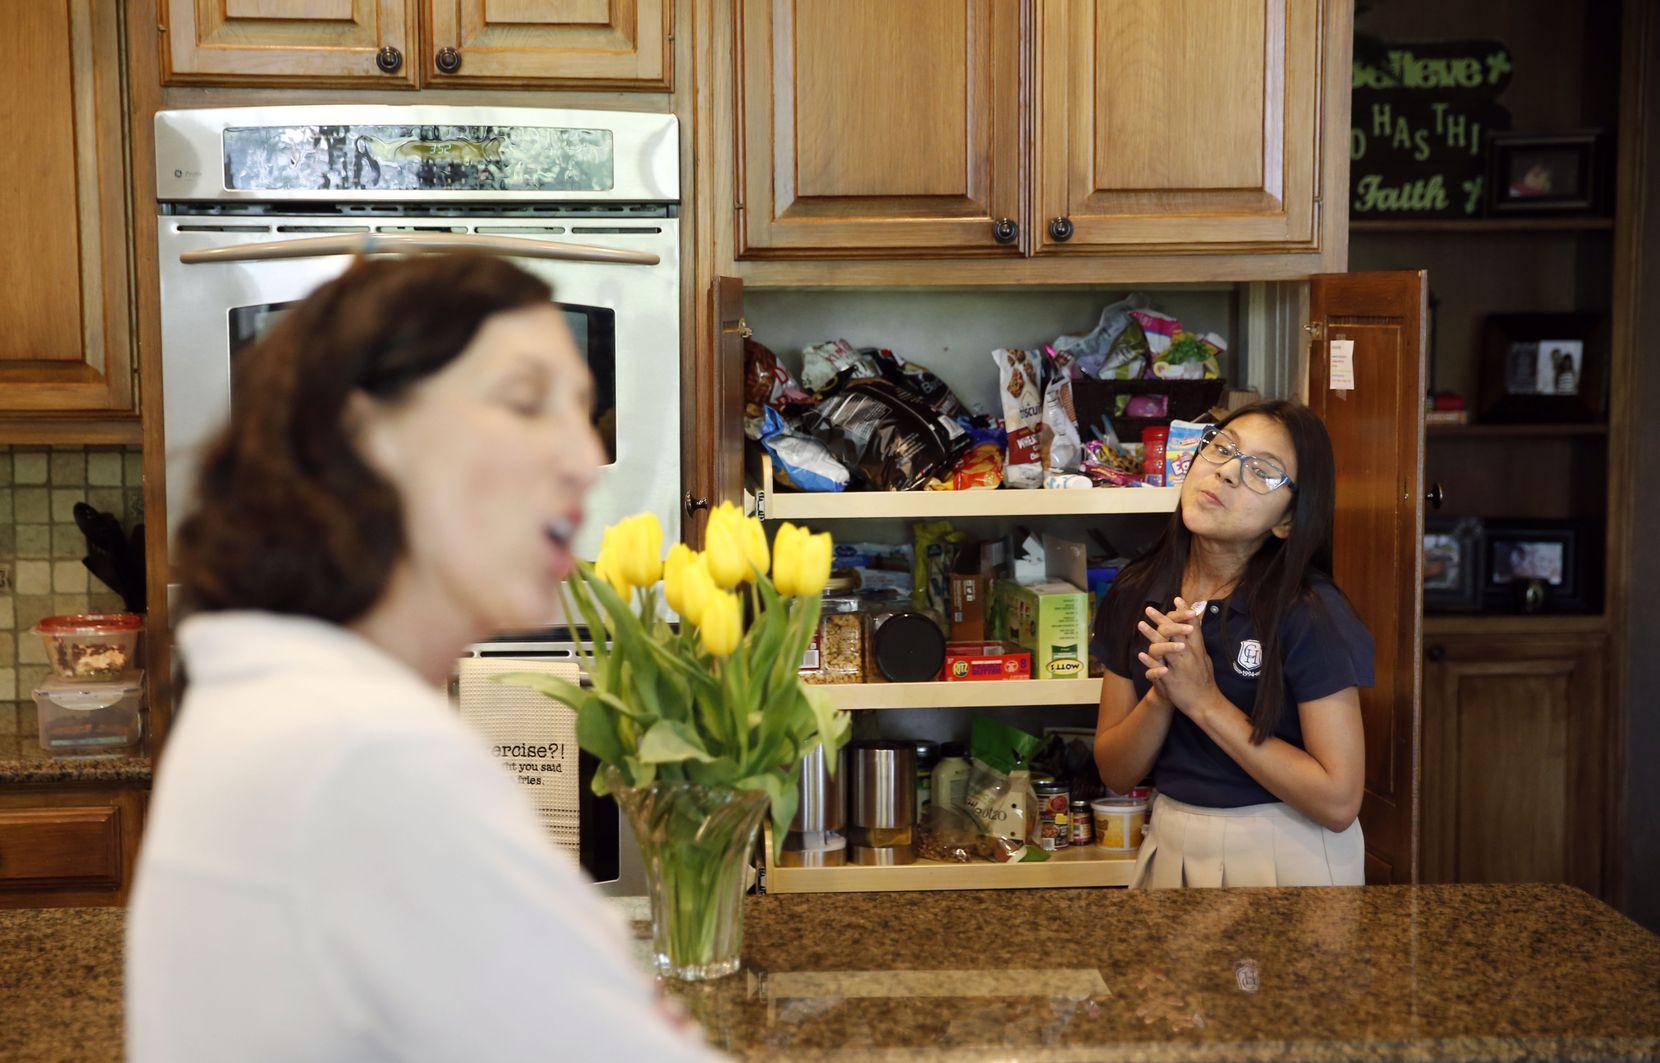 Emi Ballard intenta convencer a su madre que le deje comer una golosina. VERNON BRYANT/DMN